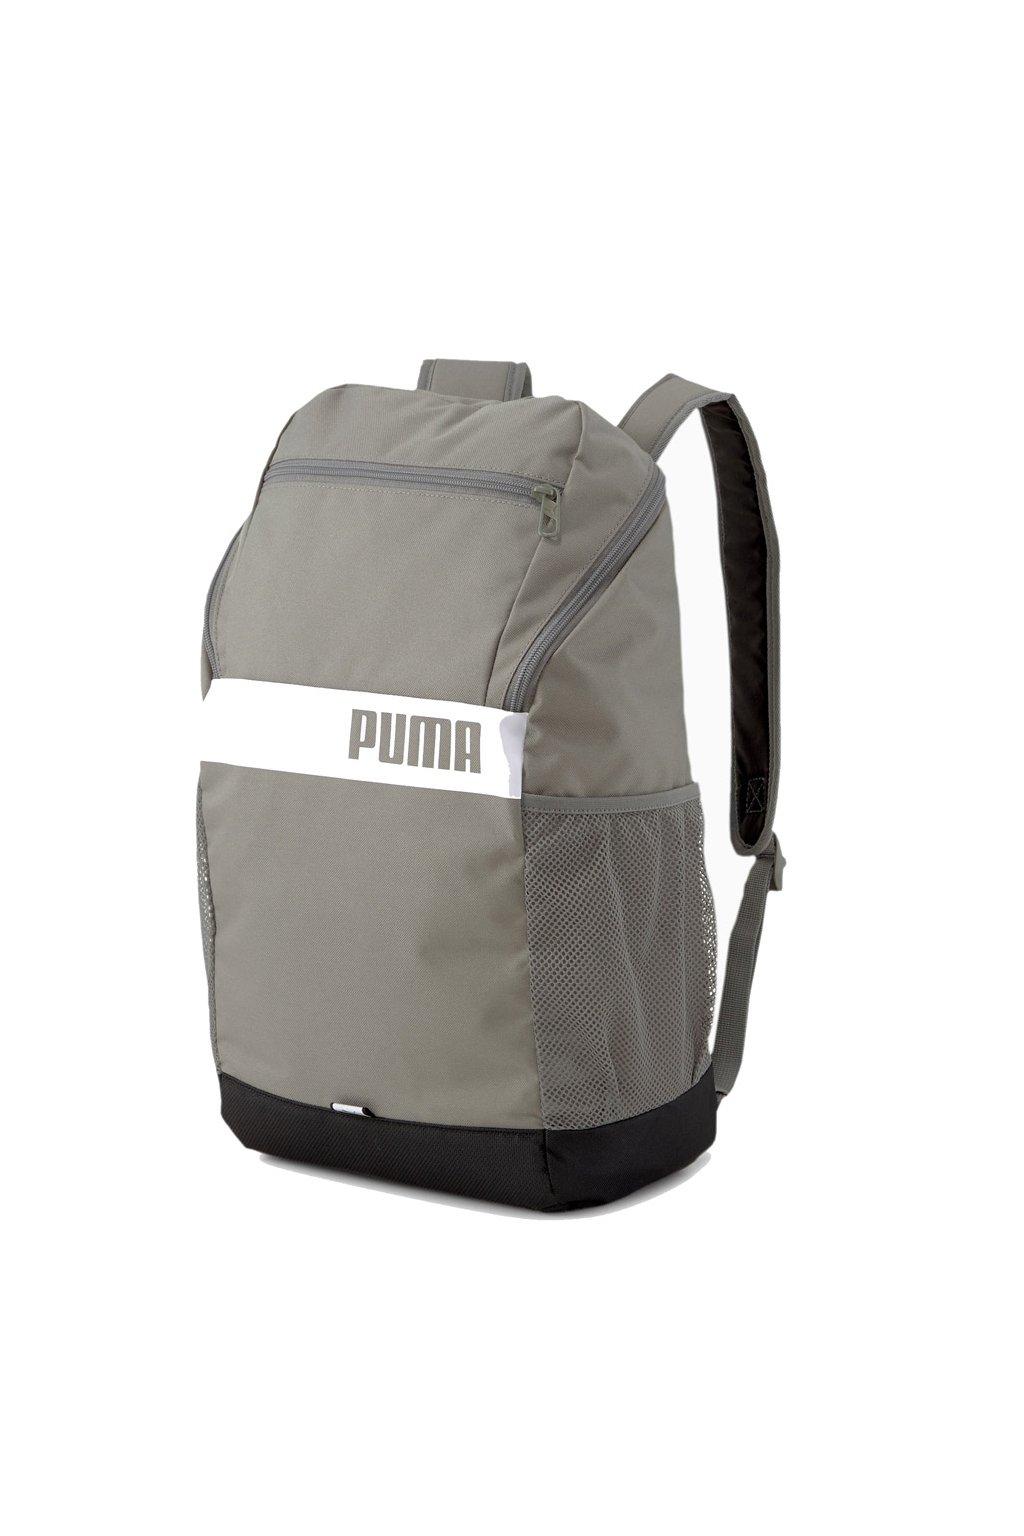 Batoh Puma Plus Backpack sivý 077292 04